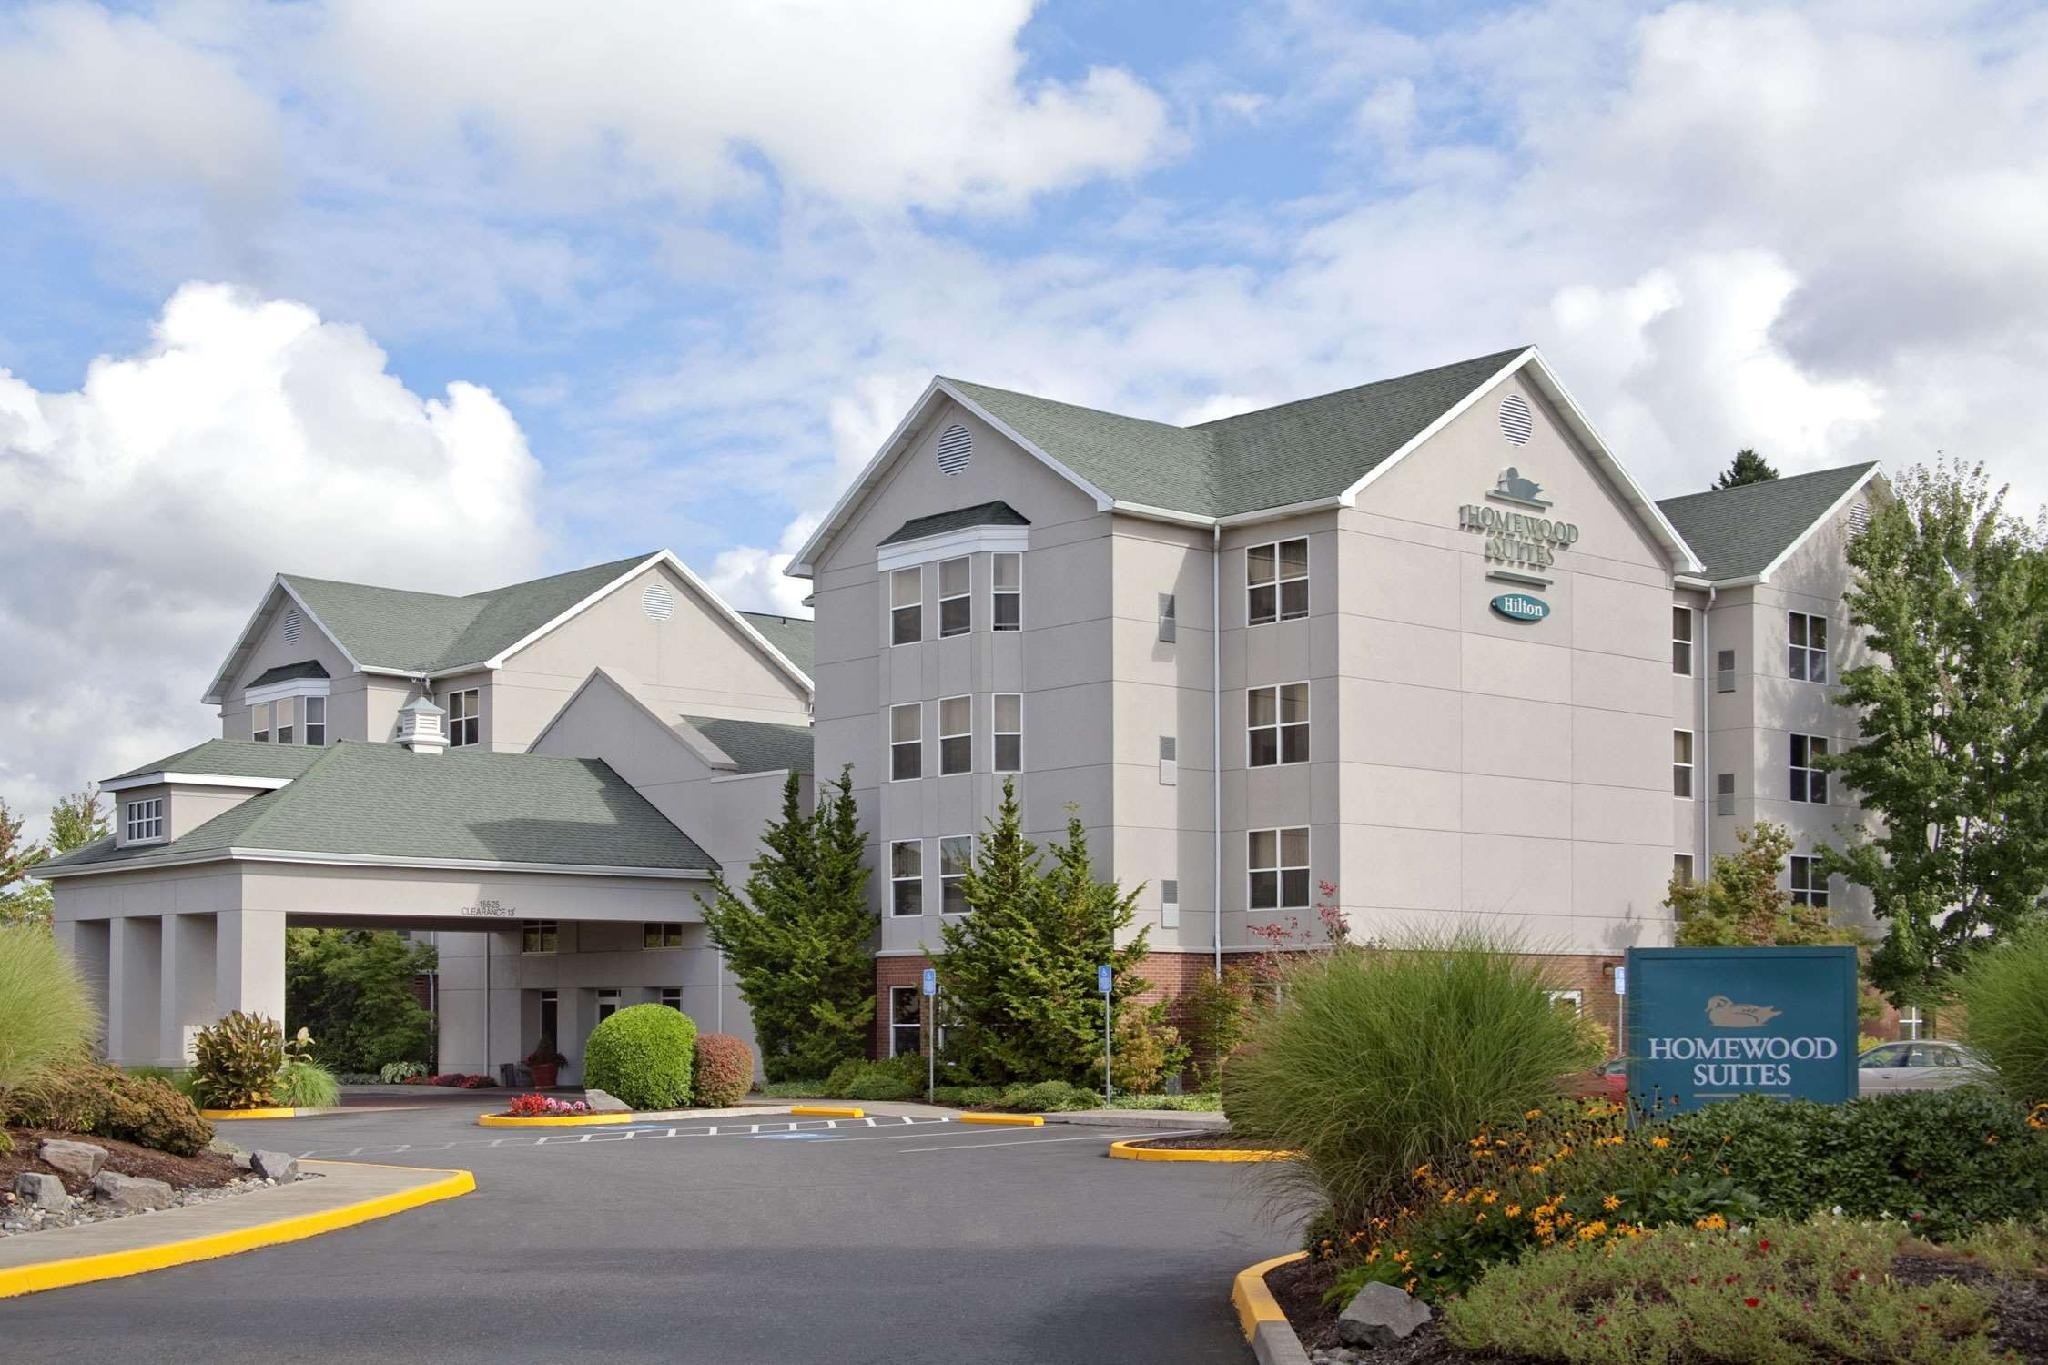 Homewood Suites By Hilton Hillsboro Beaverton